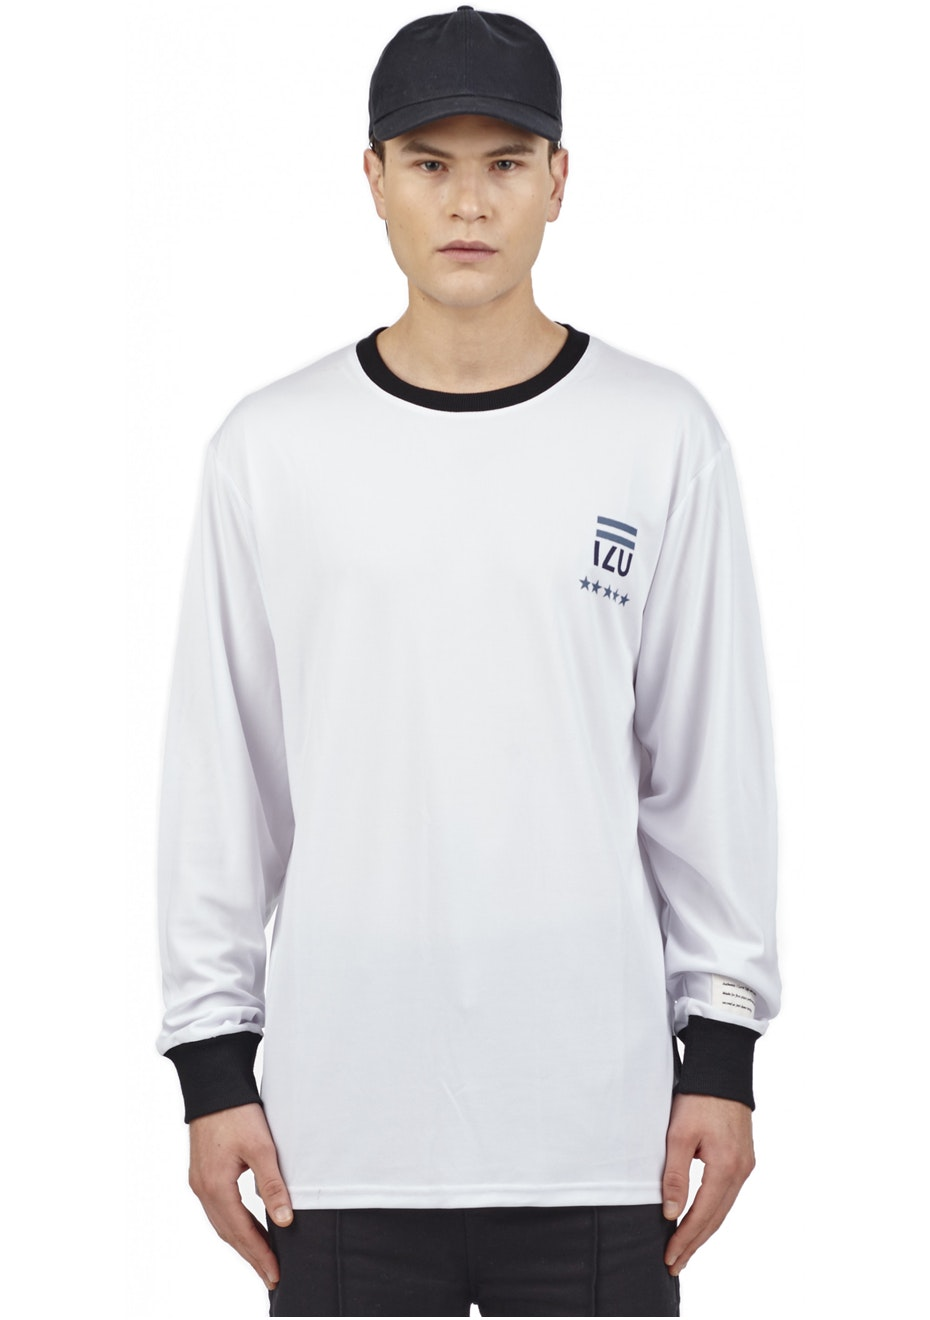 I Love Ugly - Zidane Ls Jersey - White